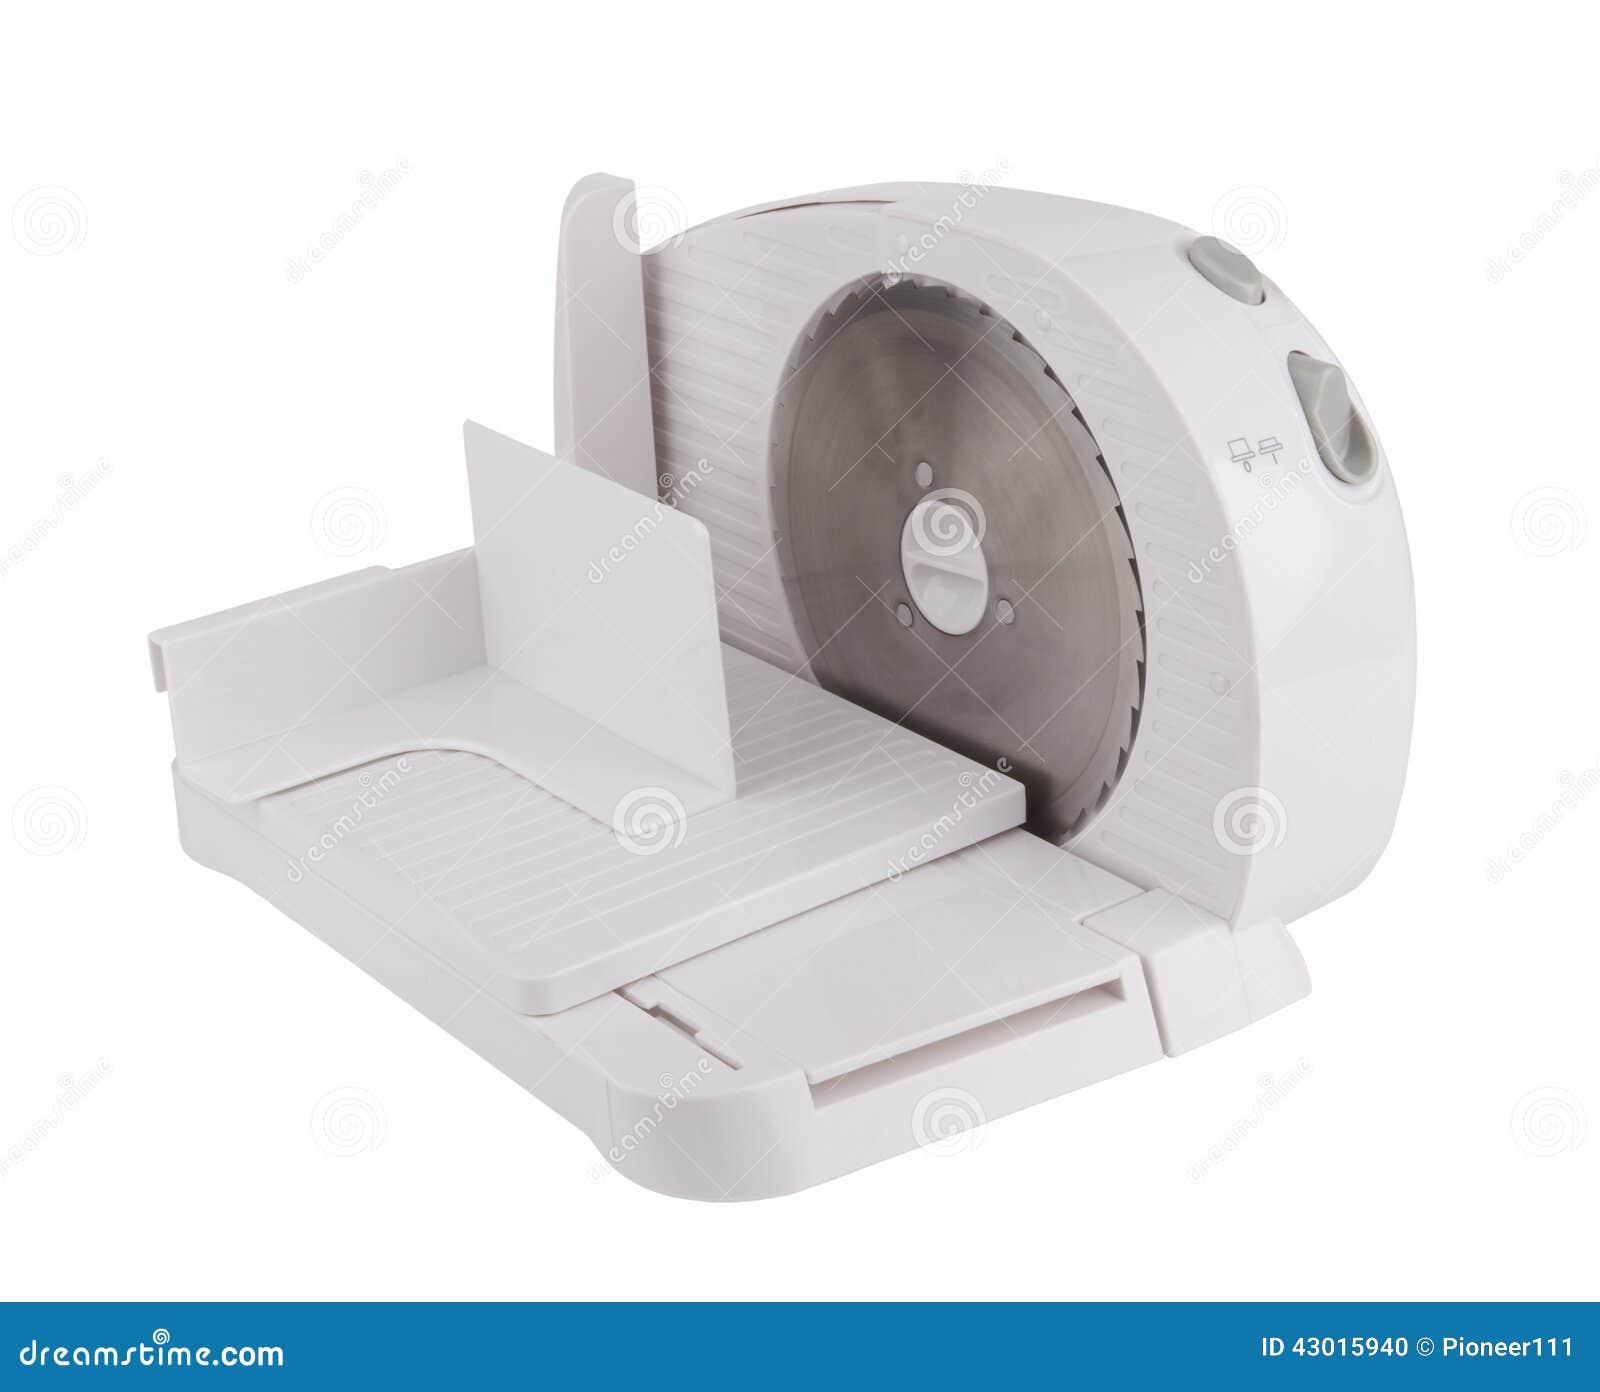 Macchina per tagliare carne tovaglioli di carta - Macchina per decorare carta ...